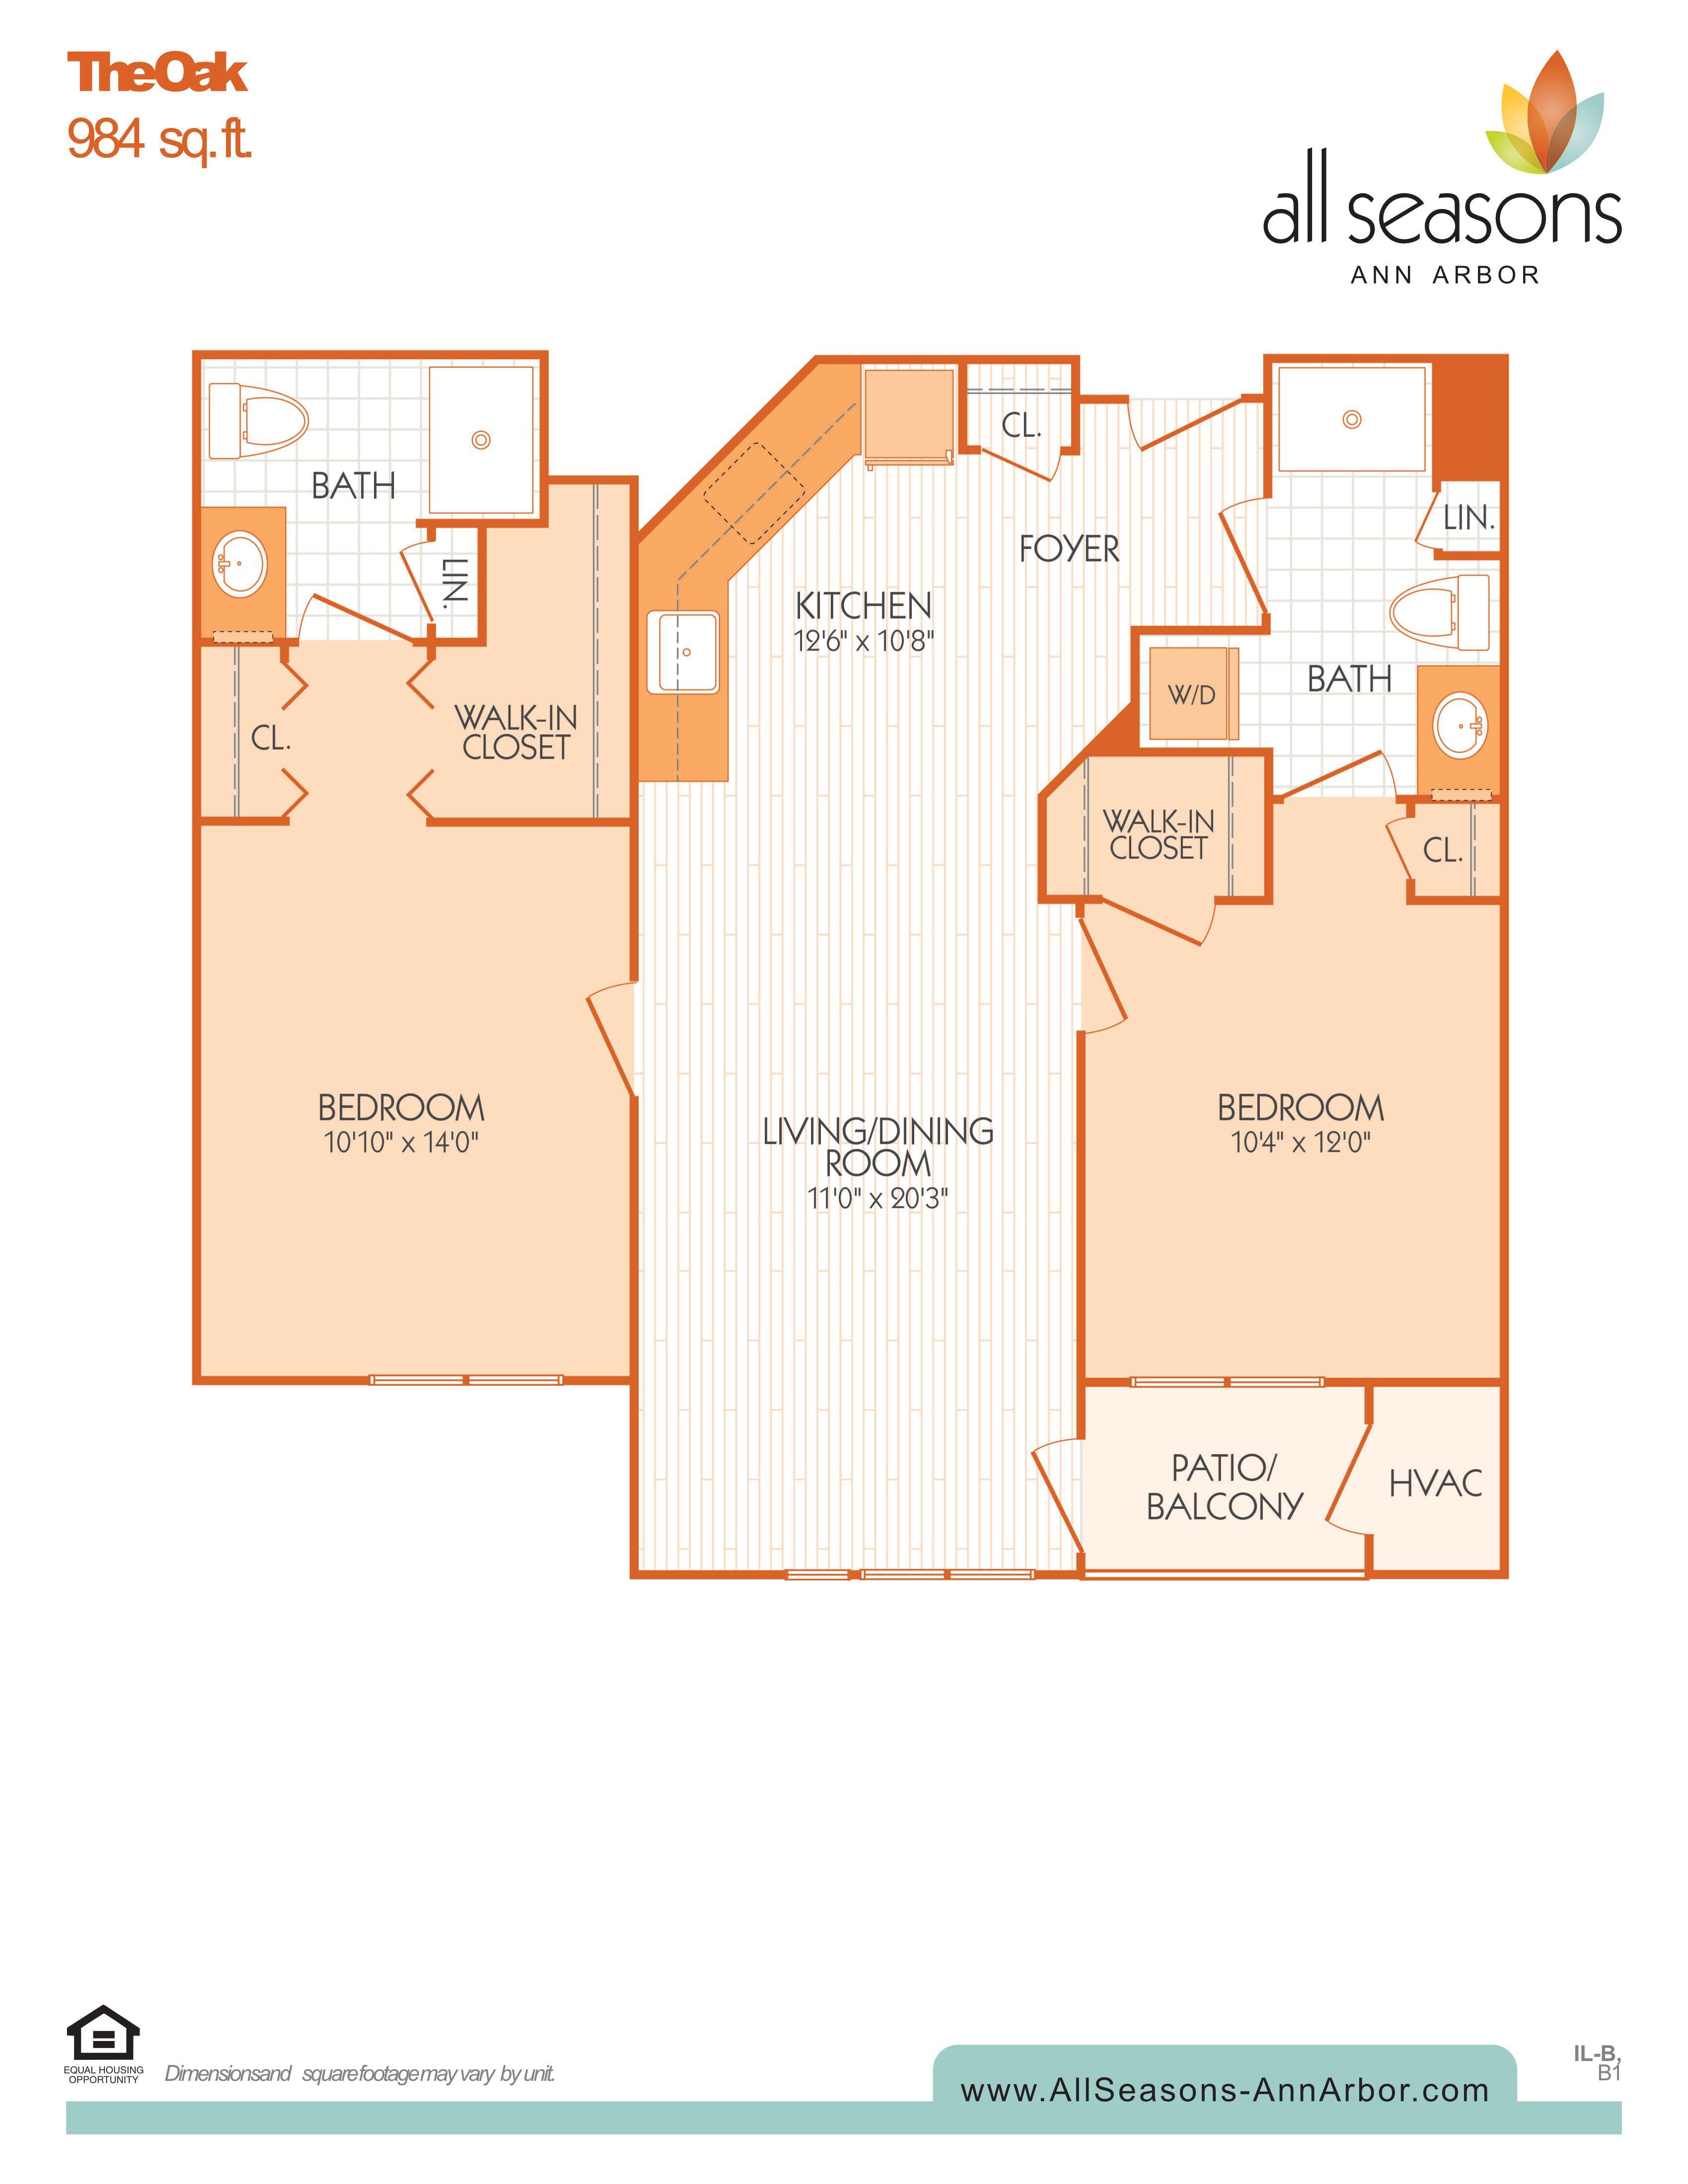 The Oak floor plan at All Seasons Ann Arbor in Ann Arbor, Michigan